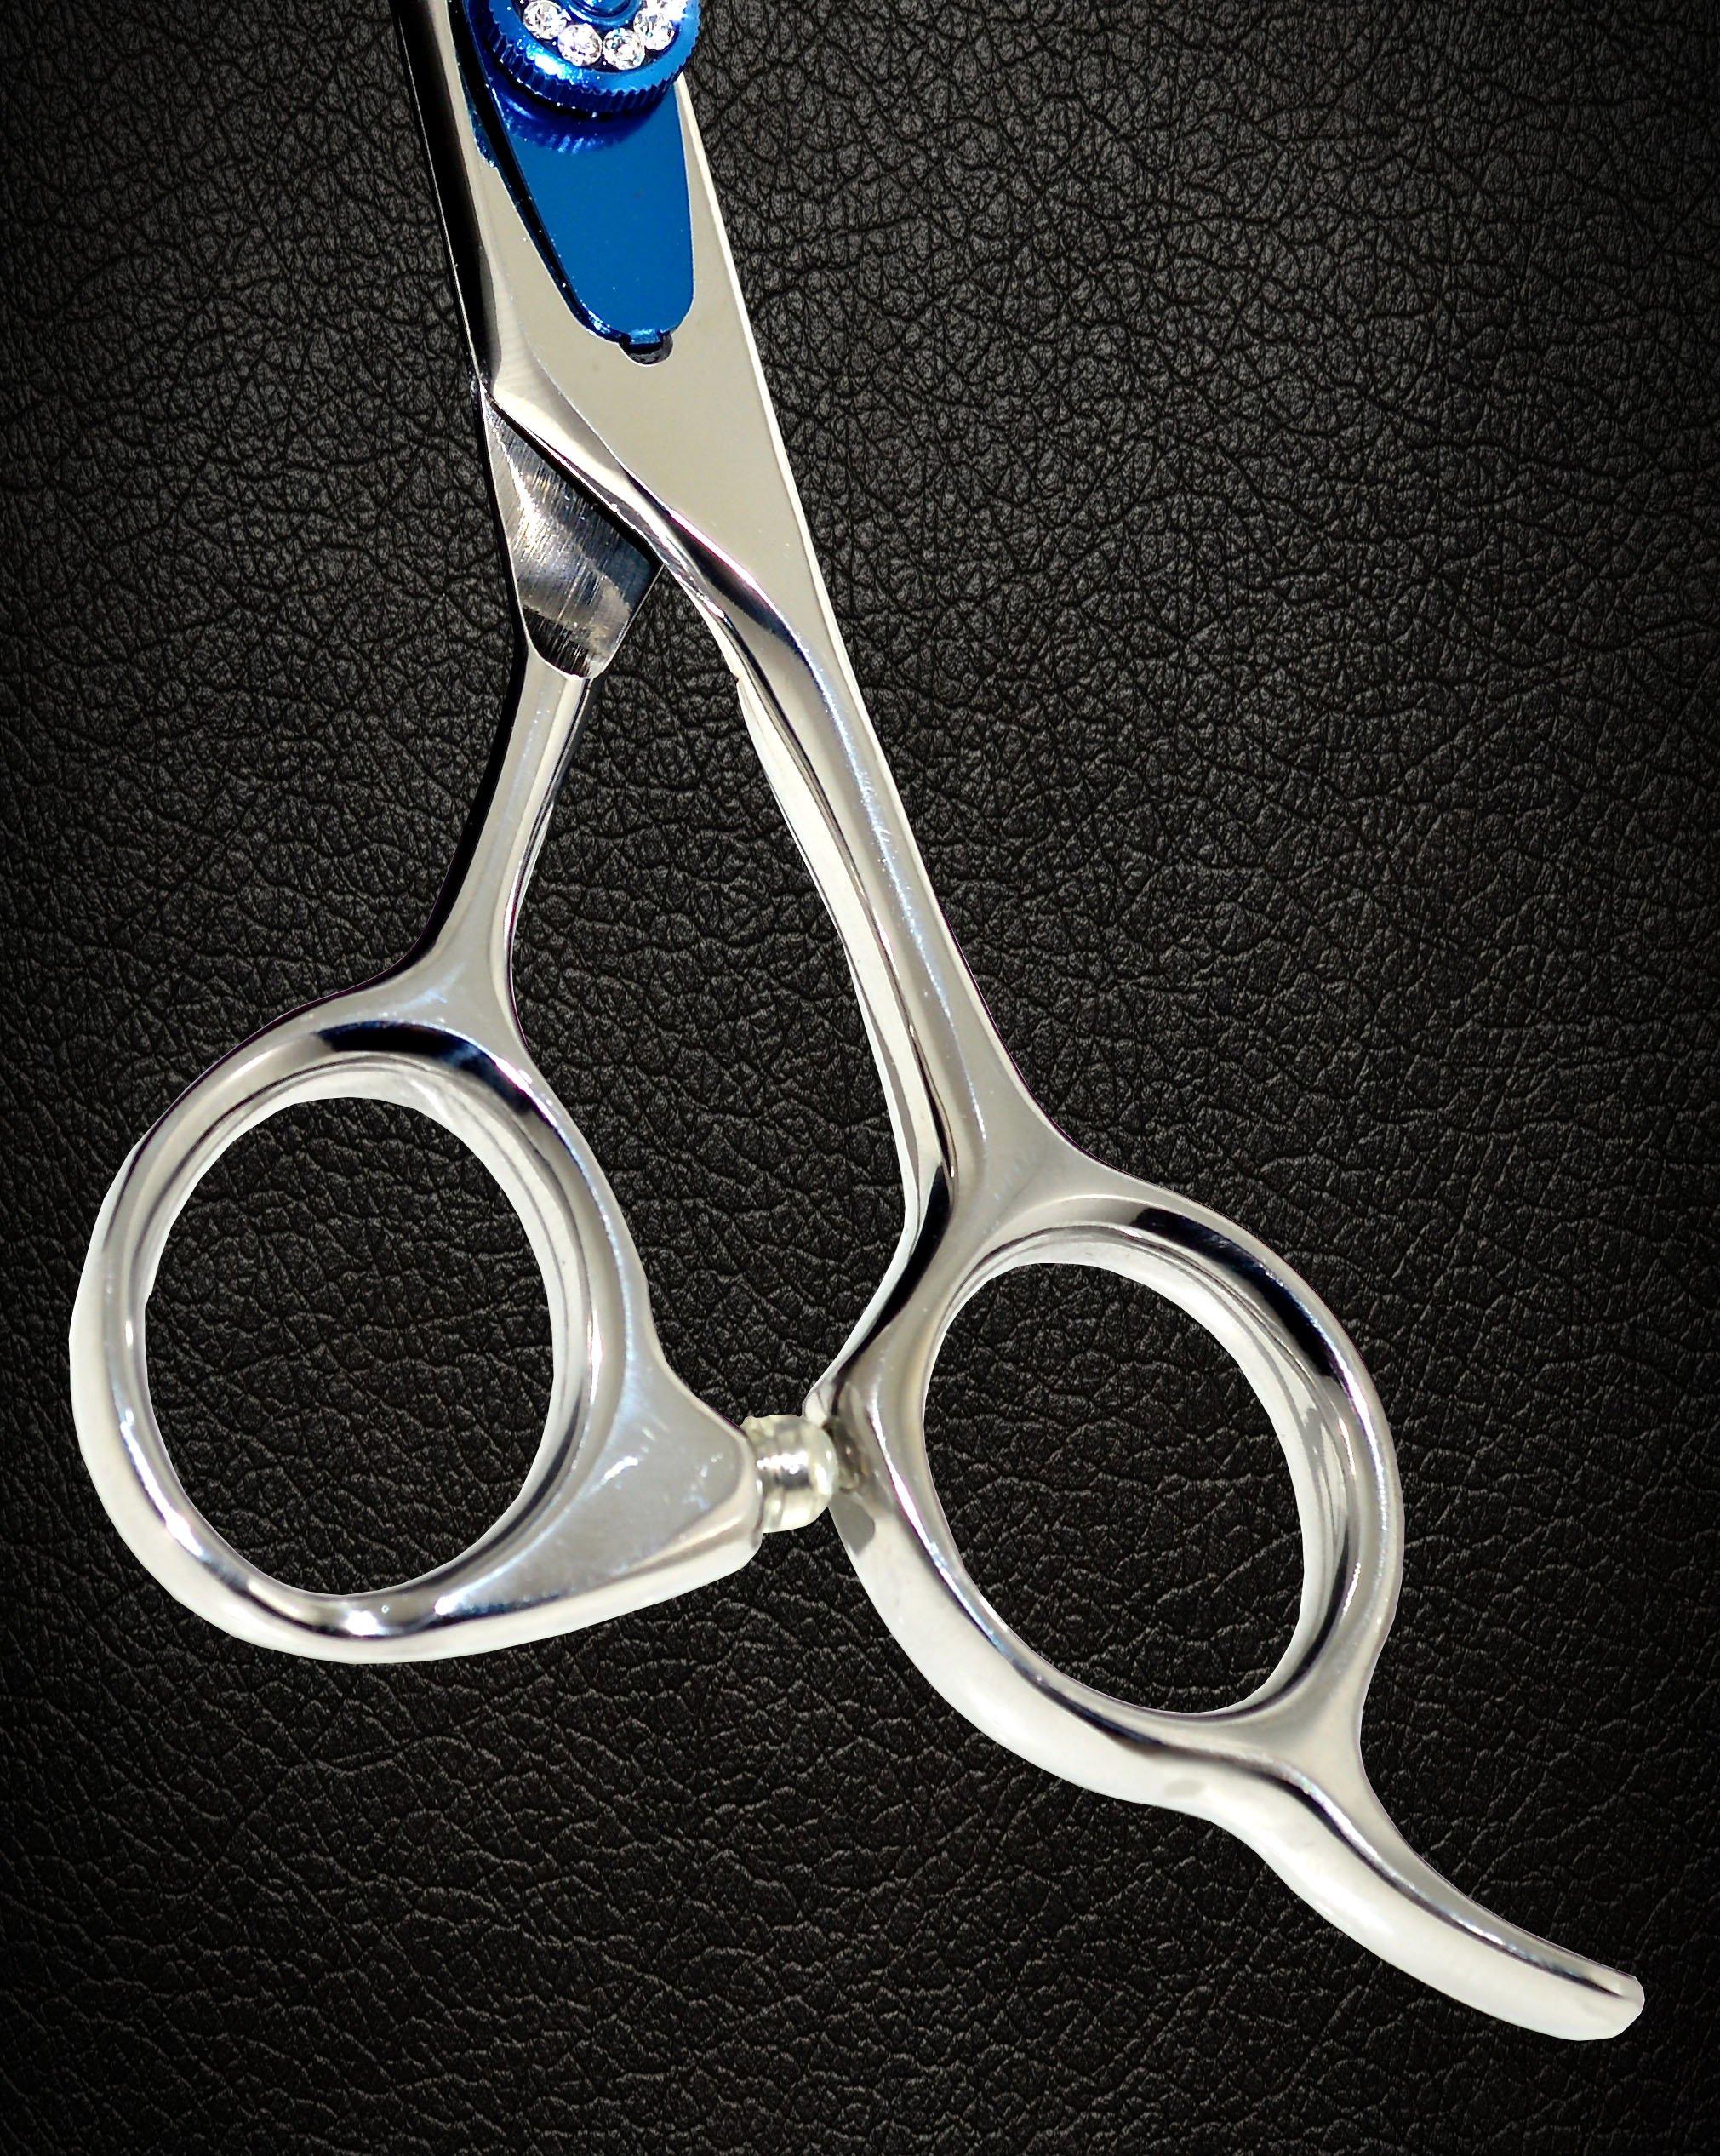 Equinox Professional Razor Edge Series - Barber Hair Cutting Scissors/Shears - 6.5'' Overall Length - Beautiful White Diamond Stones with Blue Chromium Fine Adjustment Tension Screw by Equinox International (Image #5)